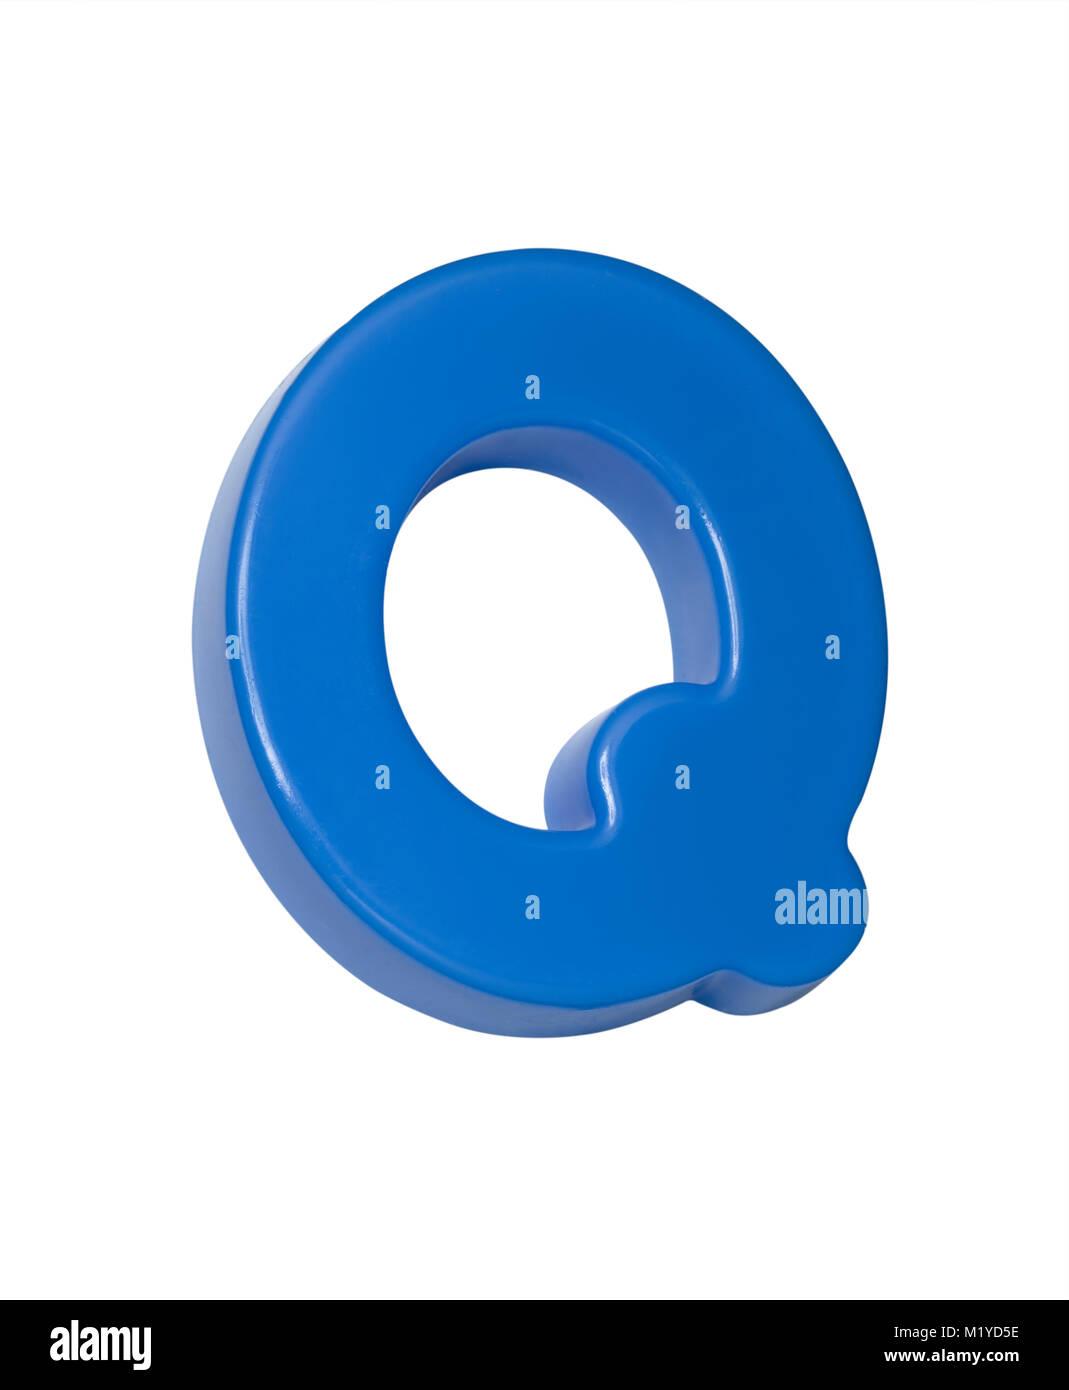 A cut out shot of a blue plastic letter 'Q' - Stock Image